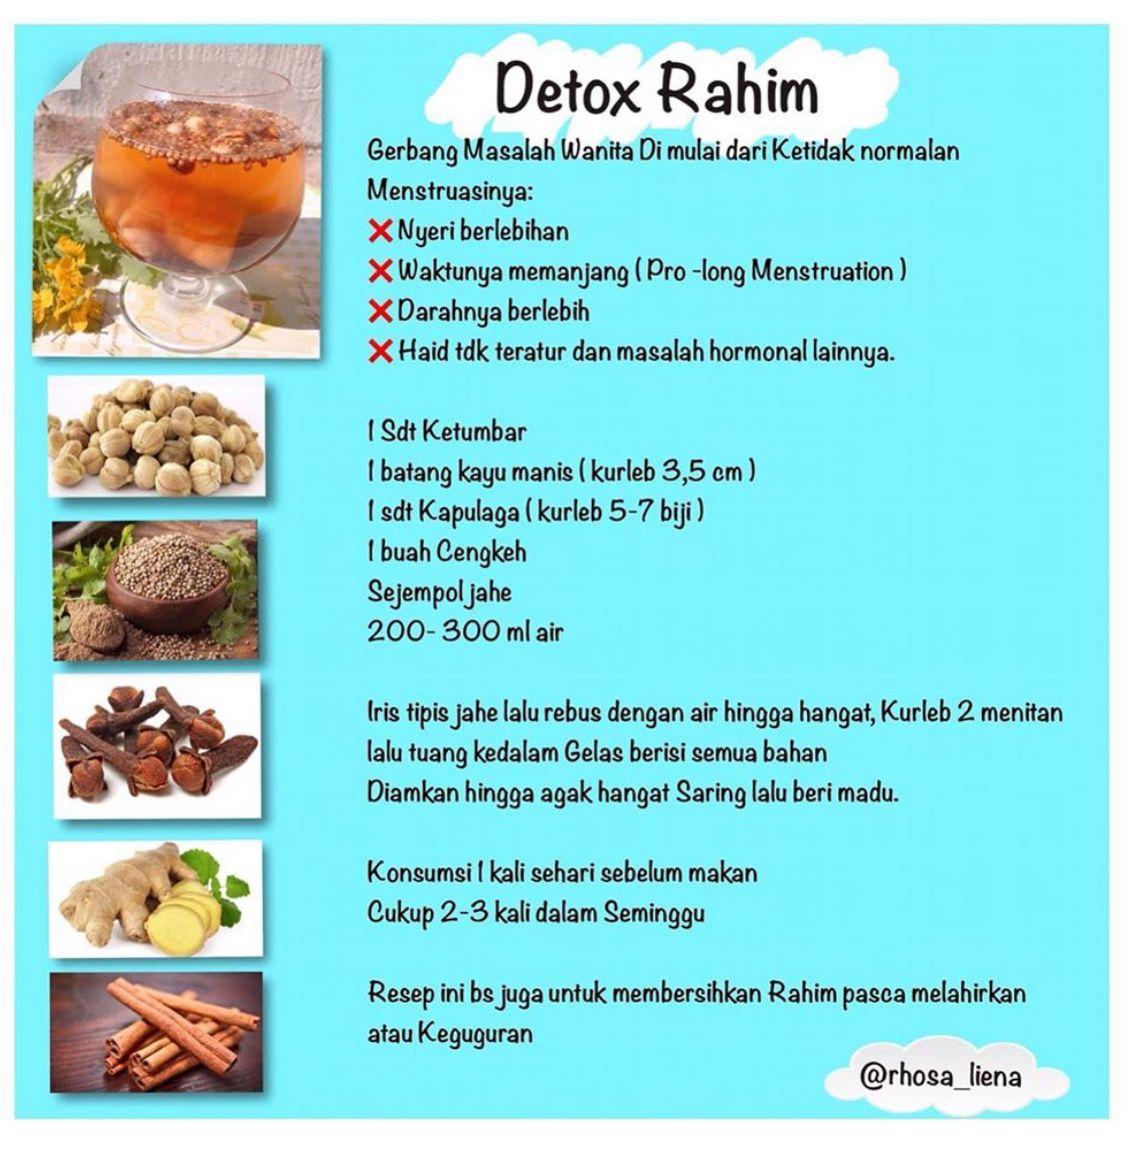 Detox Rahim Haid Tidak Lancar Keputihan Memperpanjang Masa Haid Diet Detoks Makanan Sehat Resep Diet